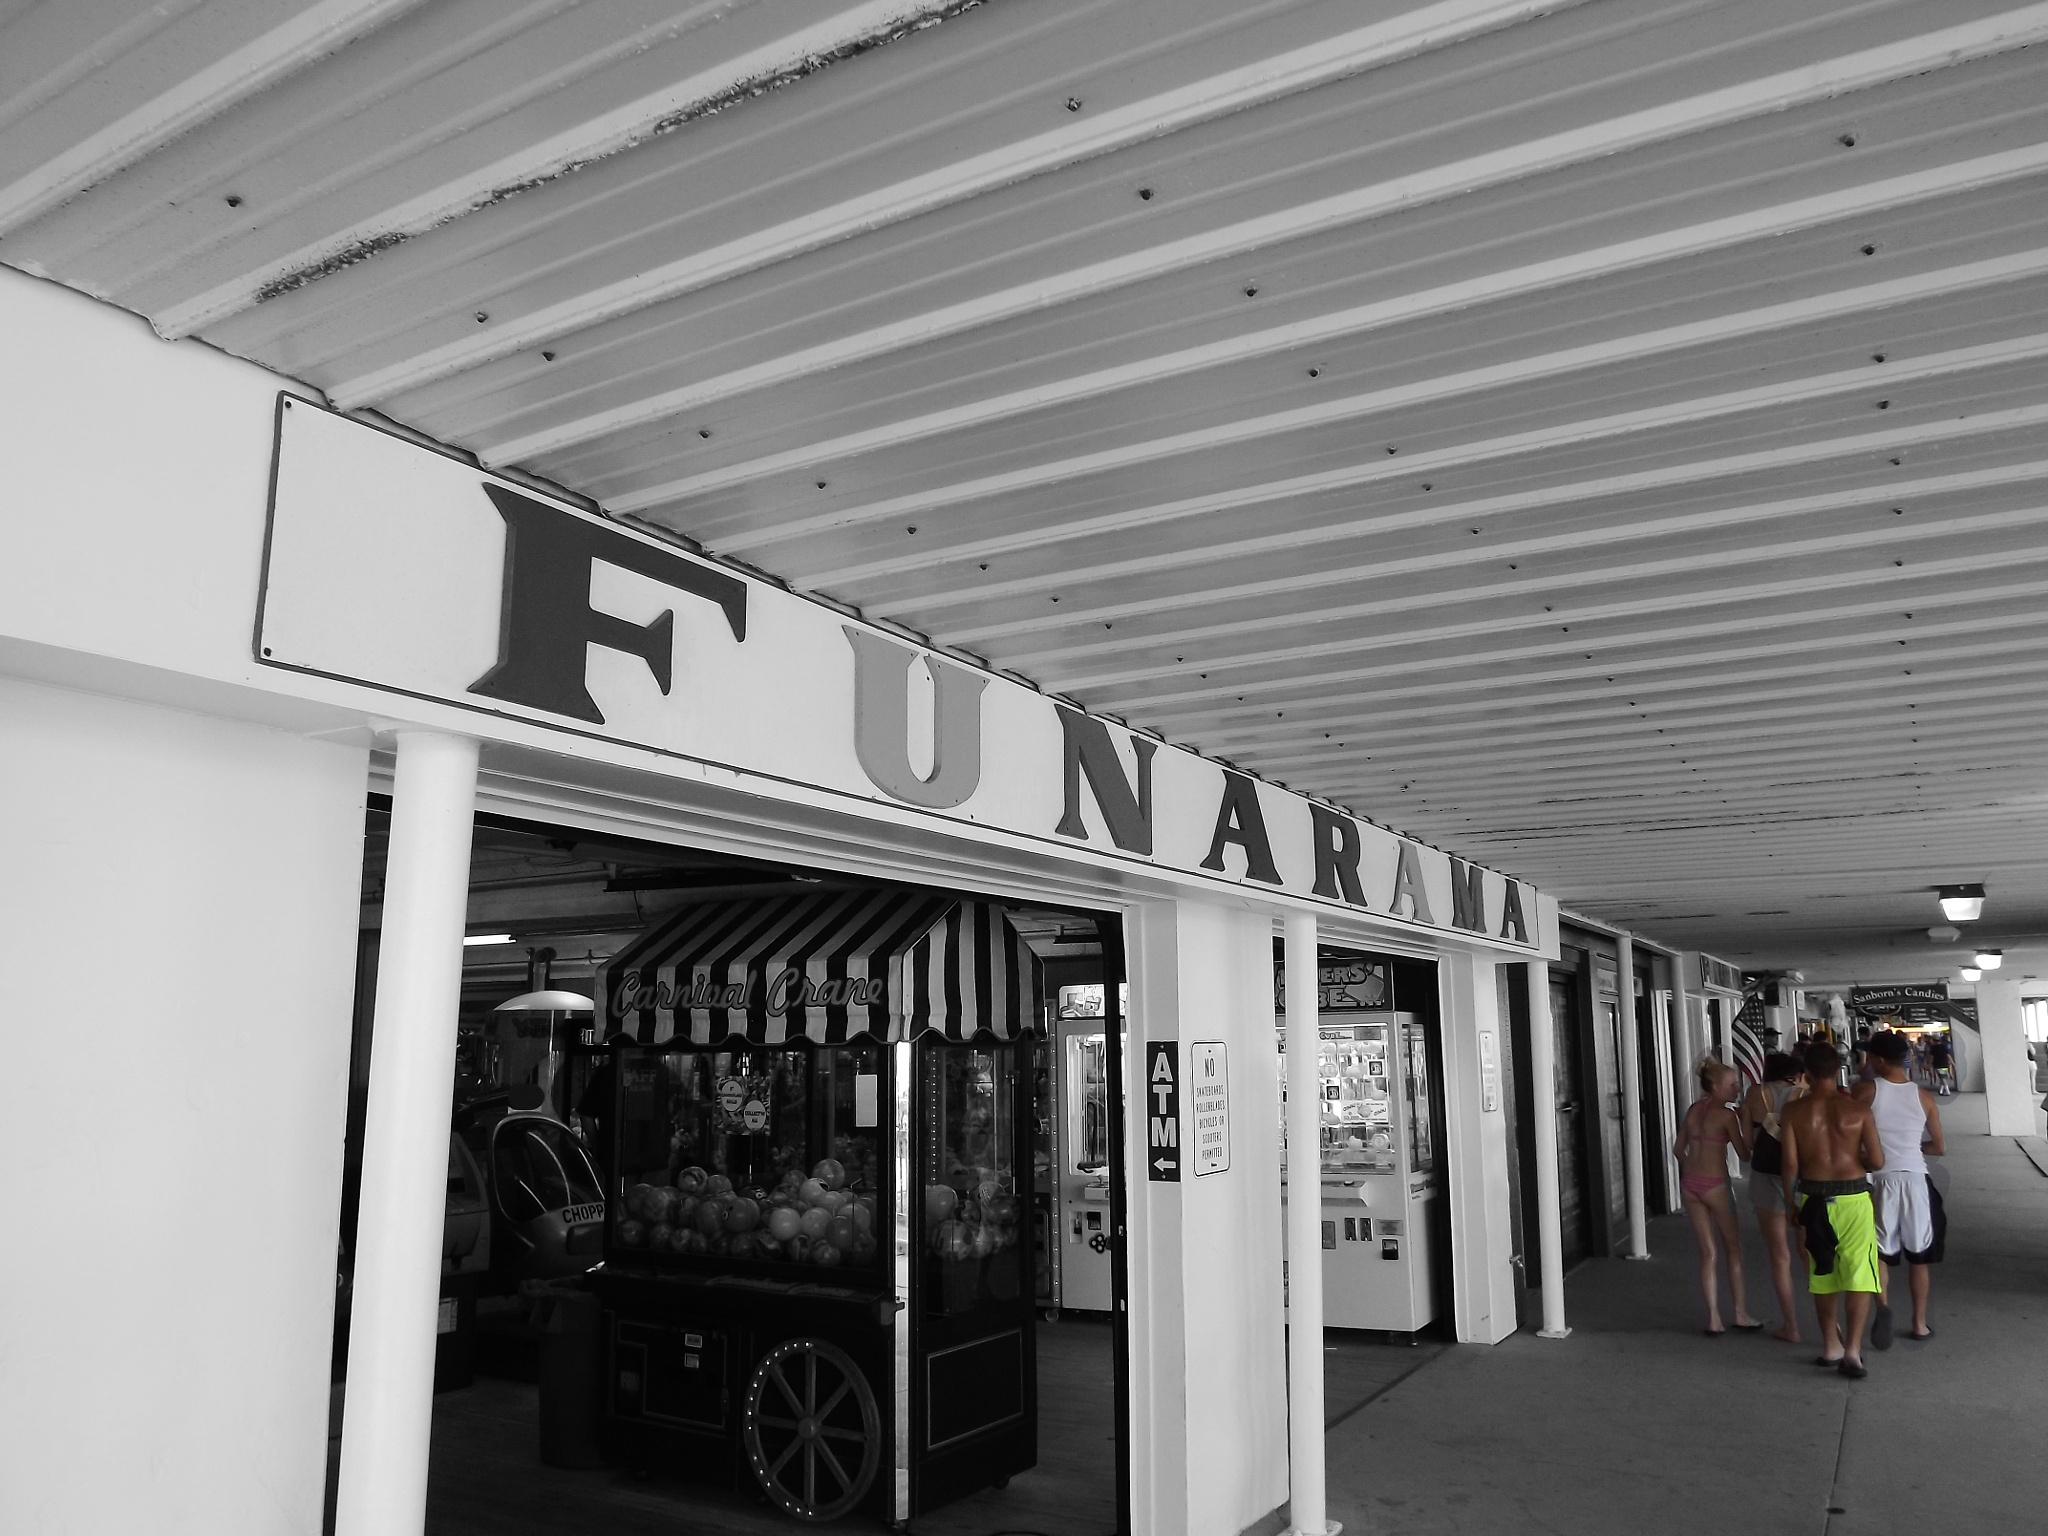 Funarama With Photoshop by coffeensmokes